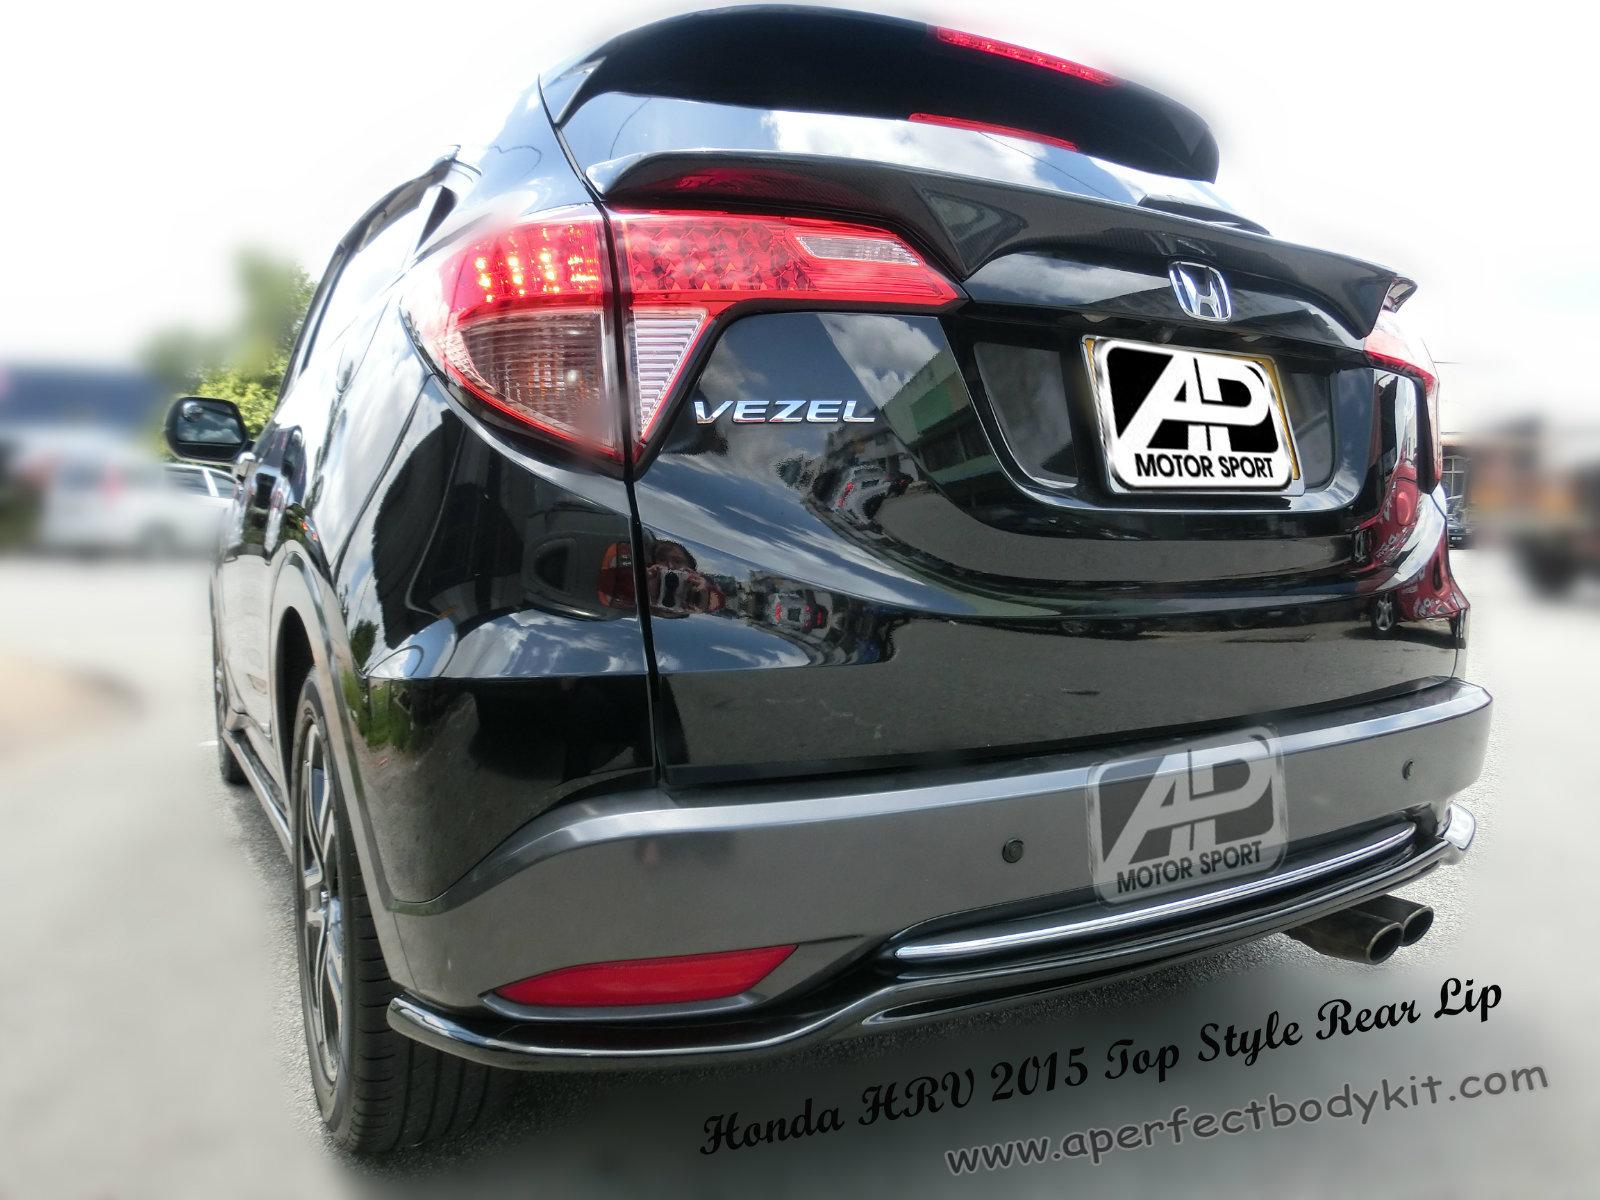 Honda Hrv Vezel 2015 Top Style Rear Lip Honda Hrv